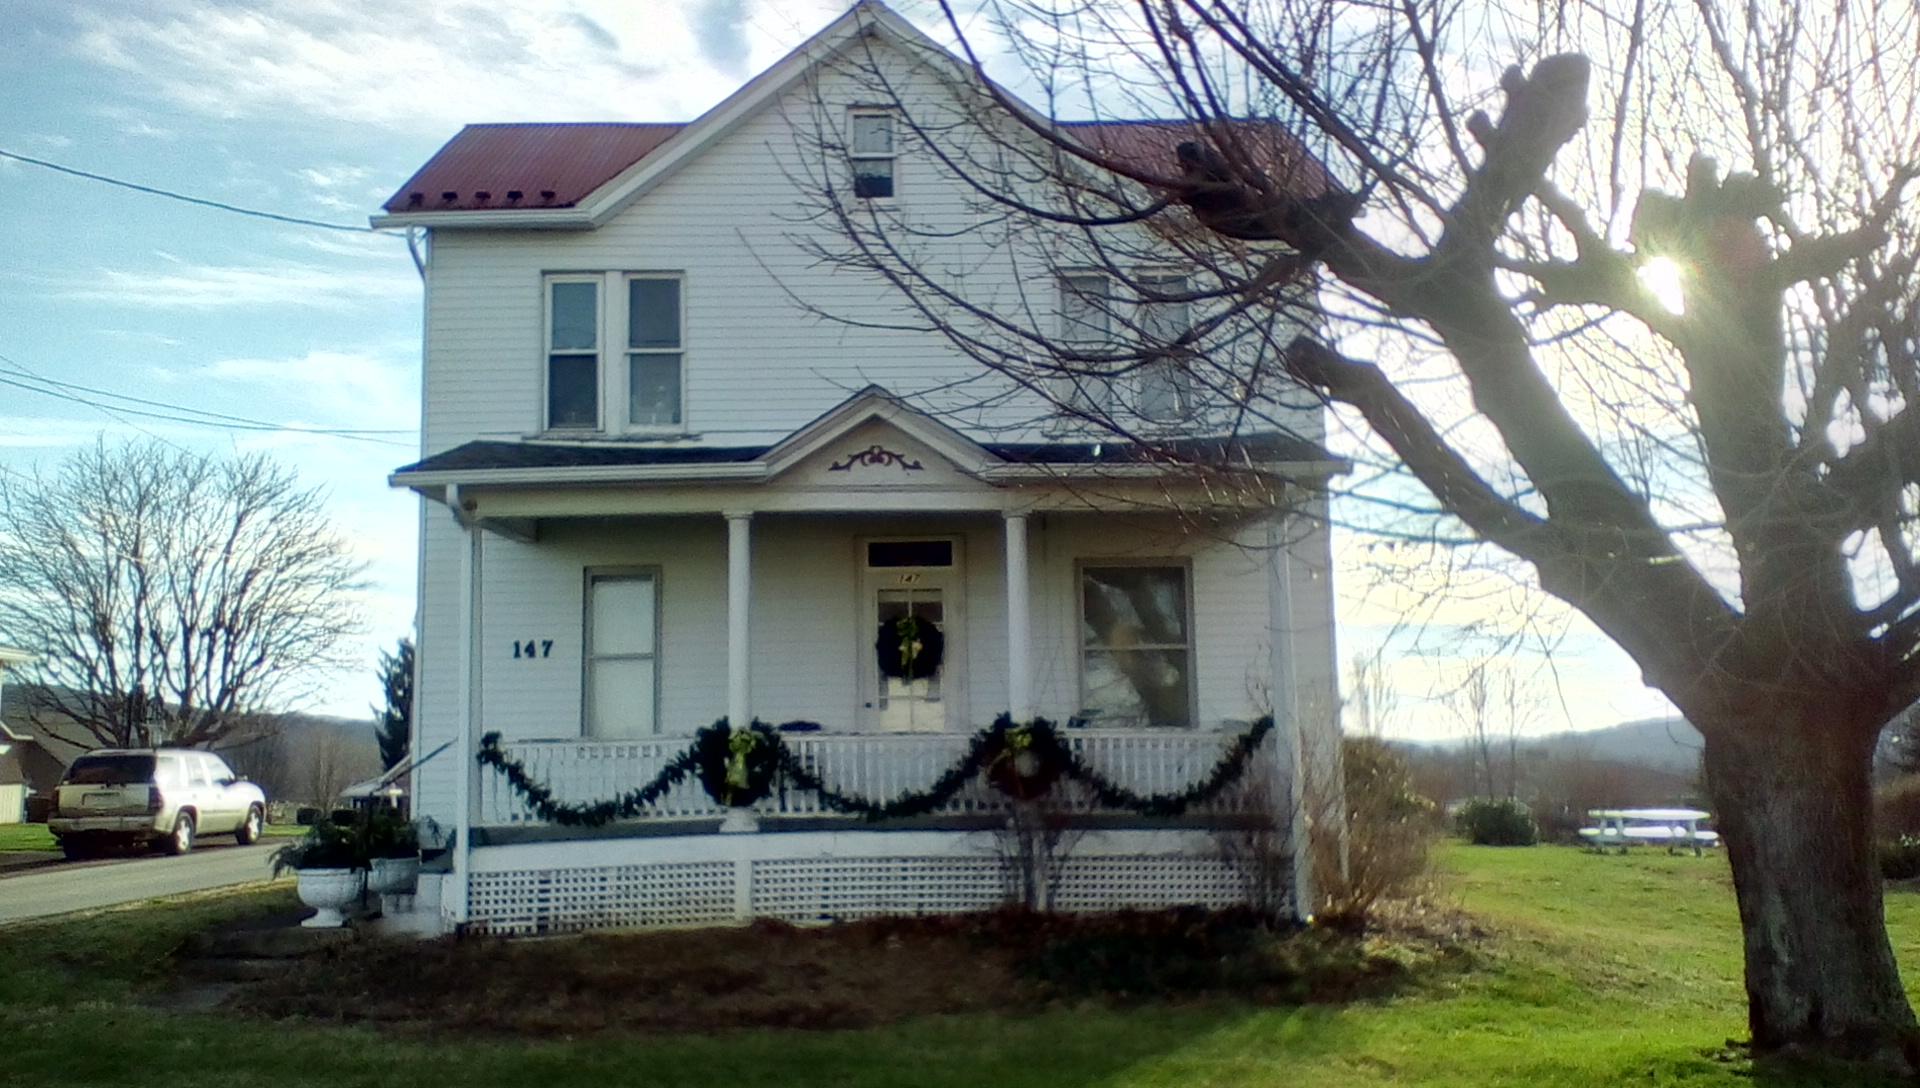 Krause house (2015) Salisbury, PA